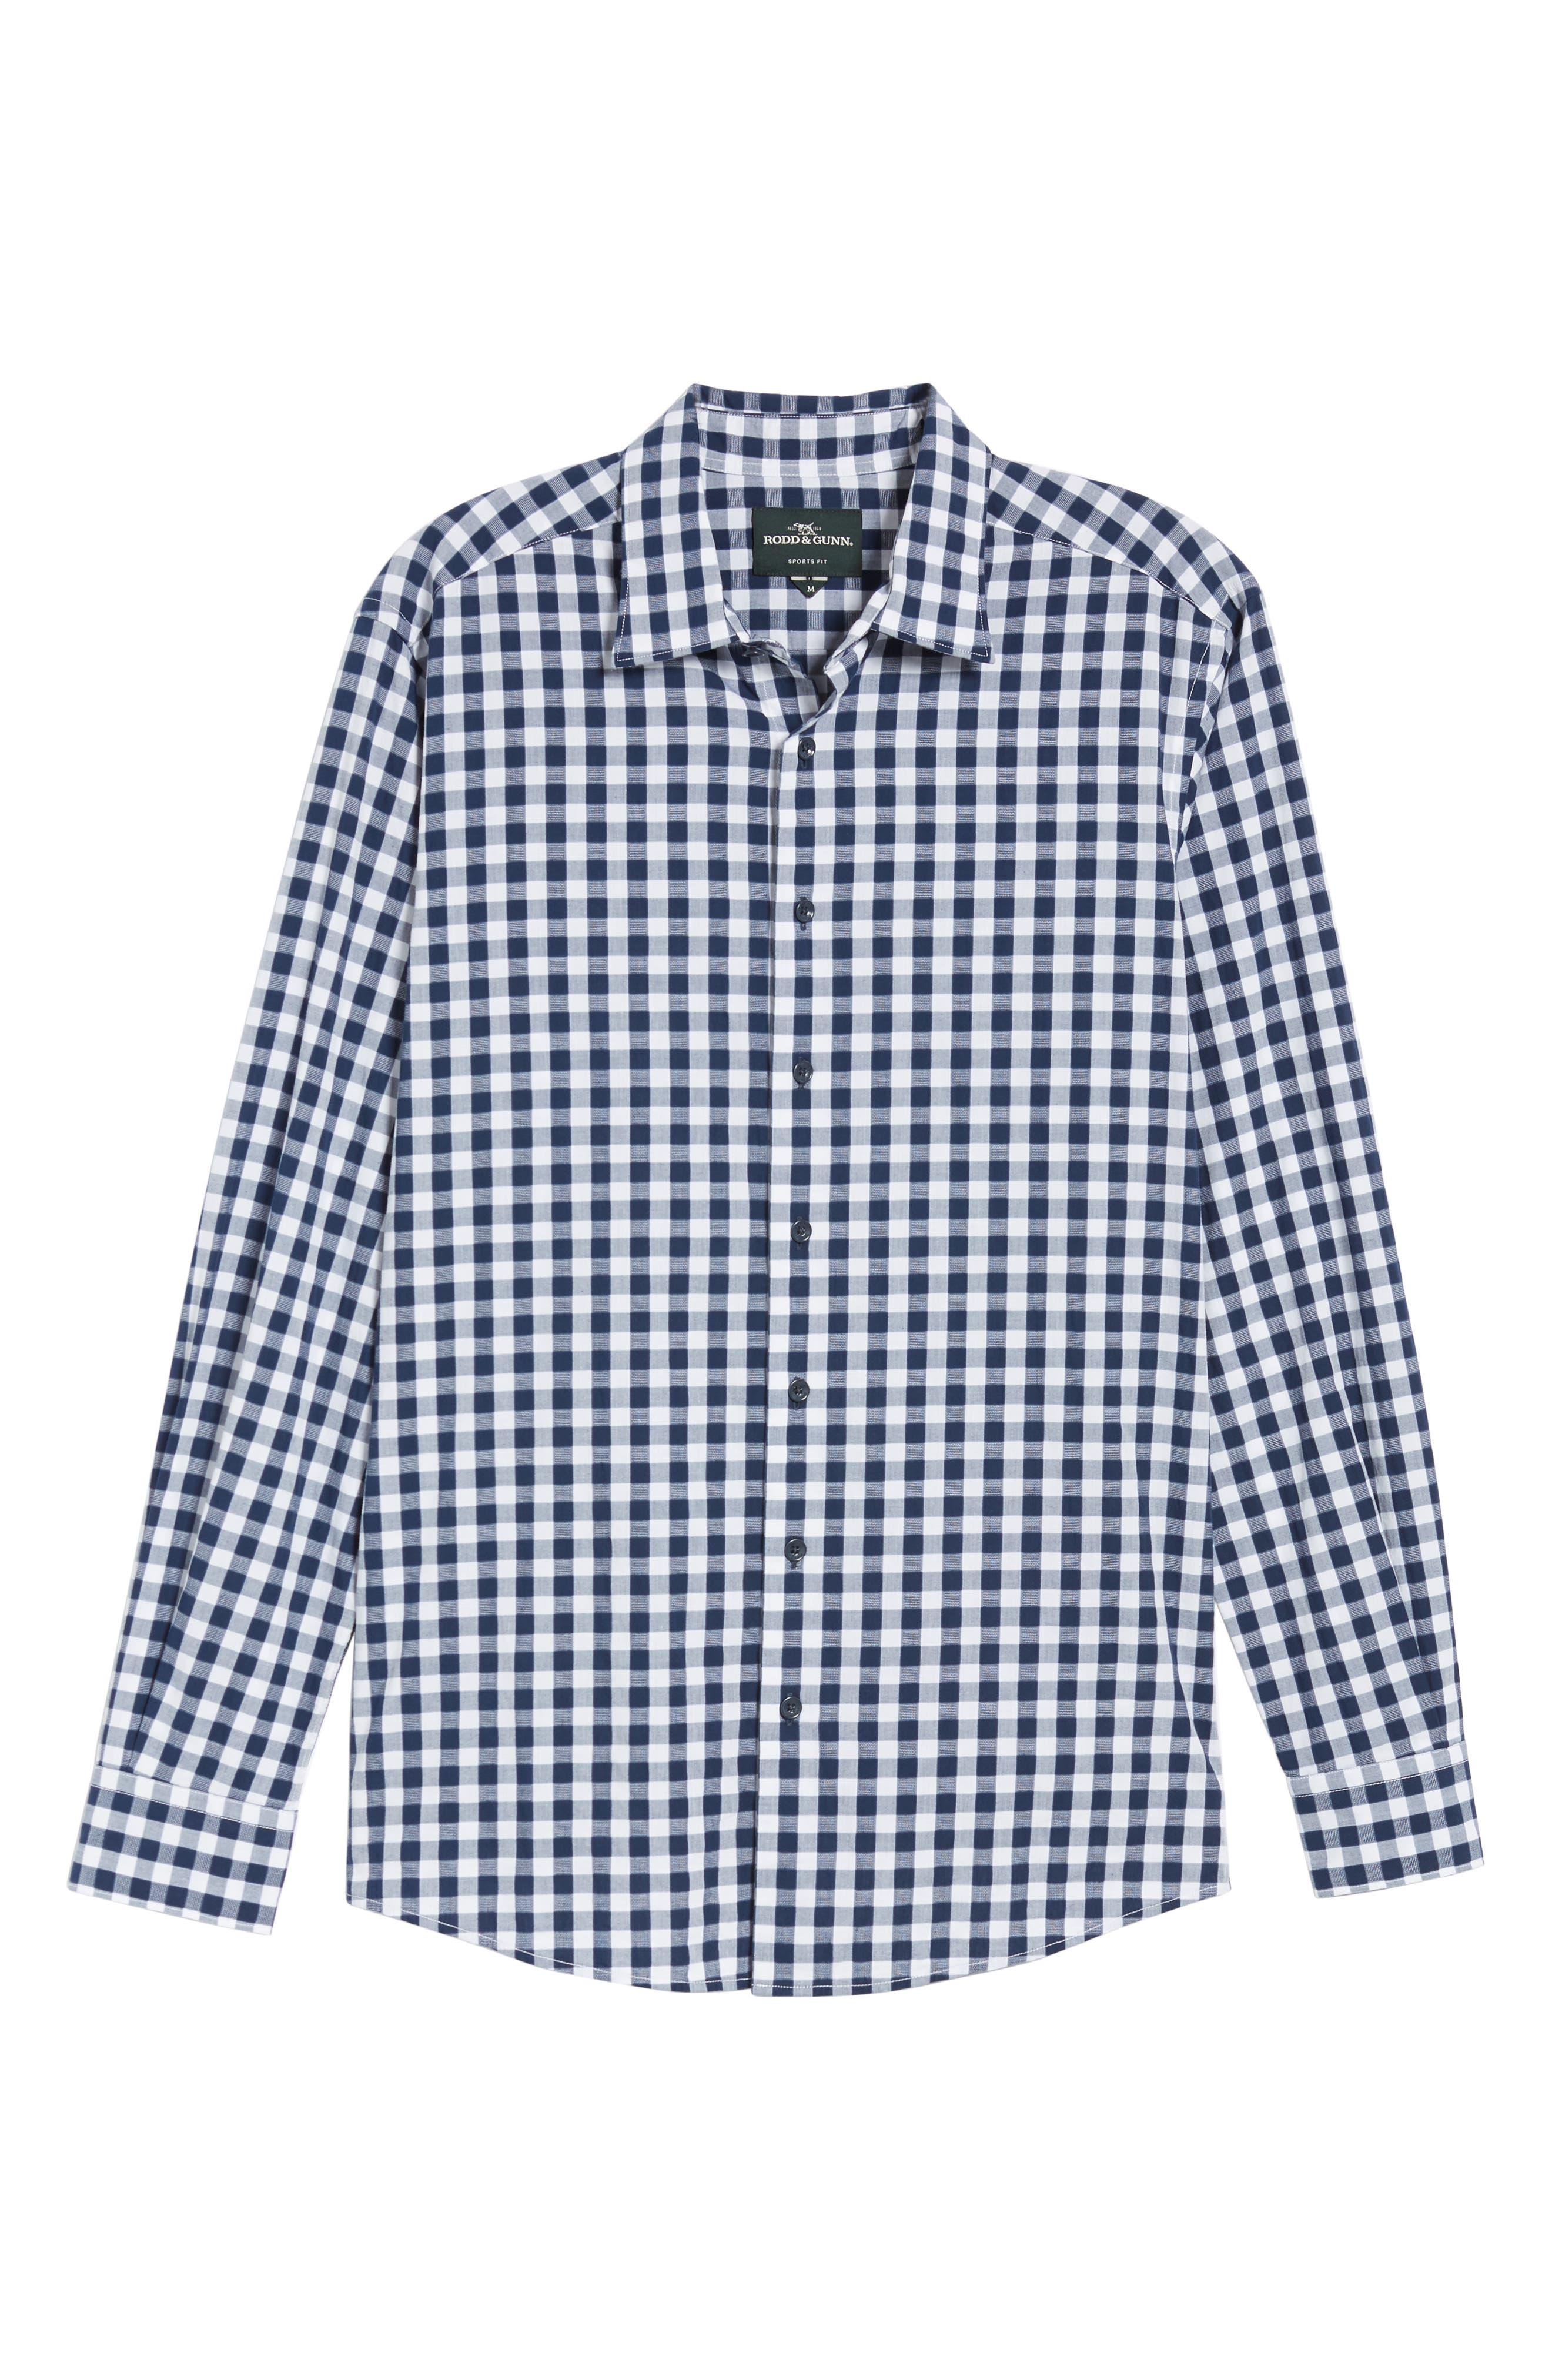 RODD & GUNN, Dixon Check Sport Shirt, Alternate thumbnail 5, color, NAVY